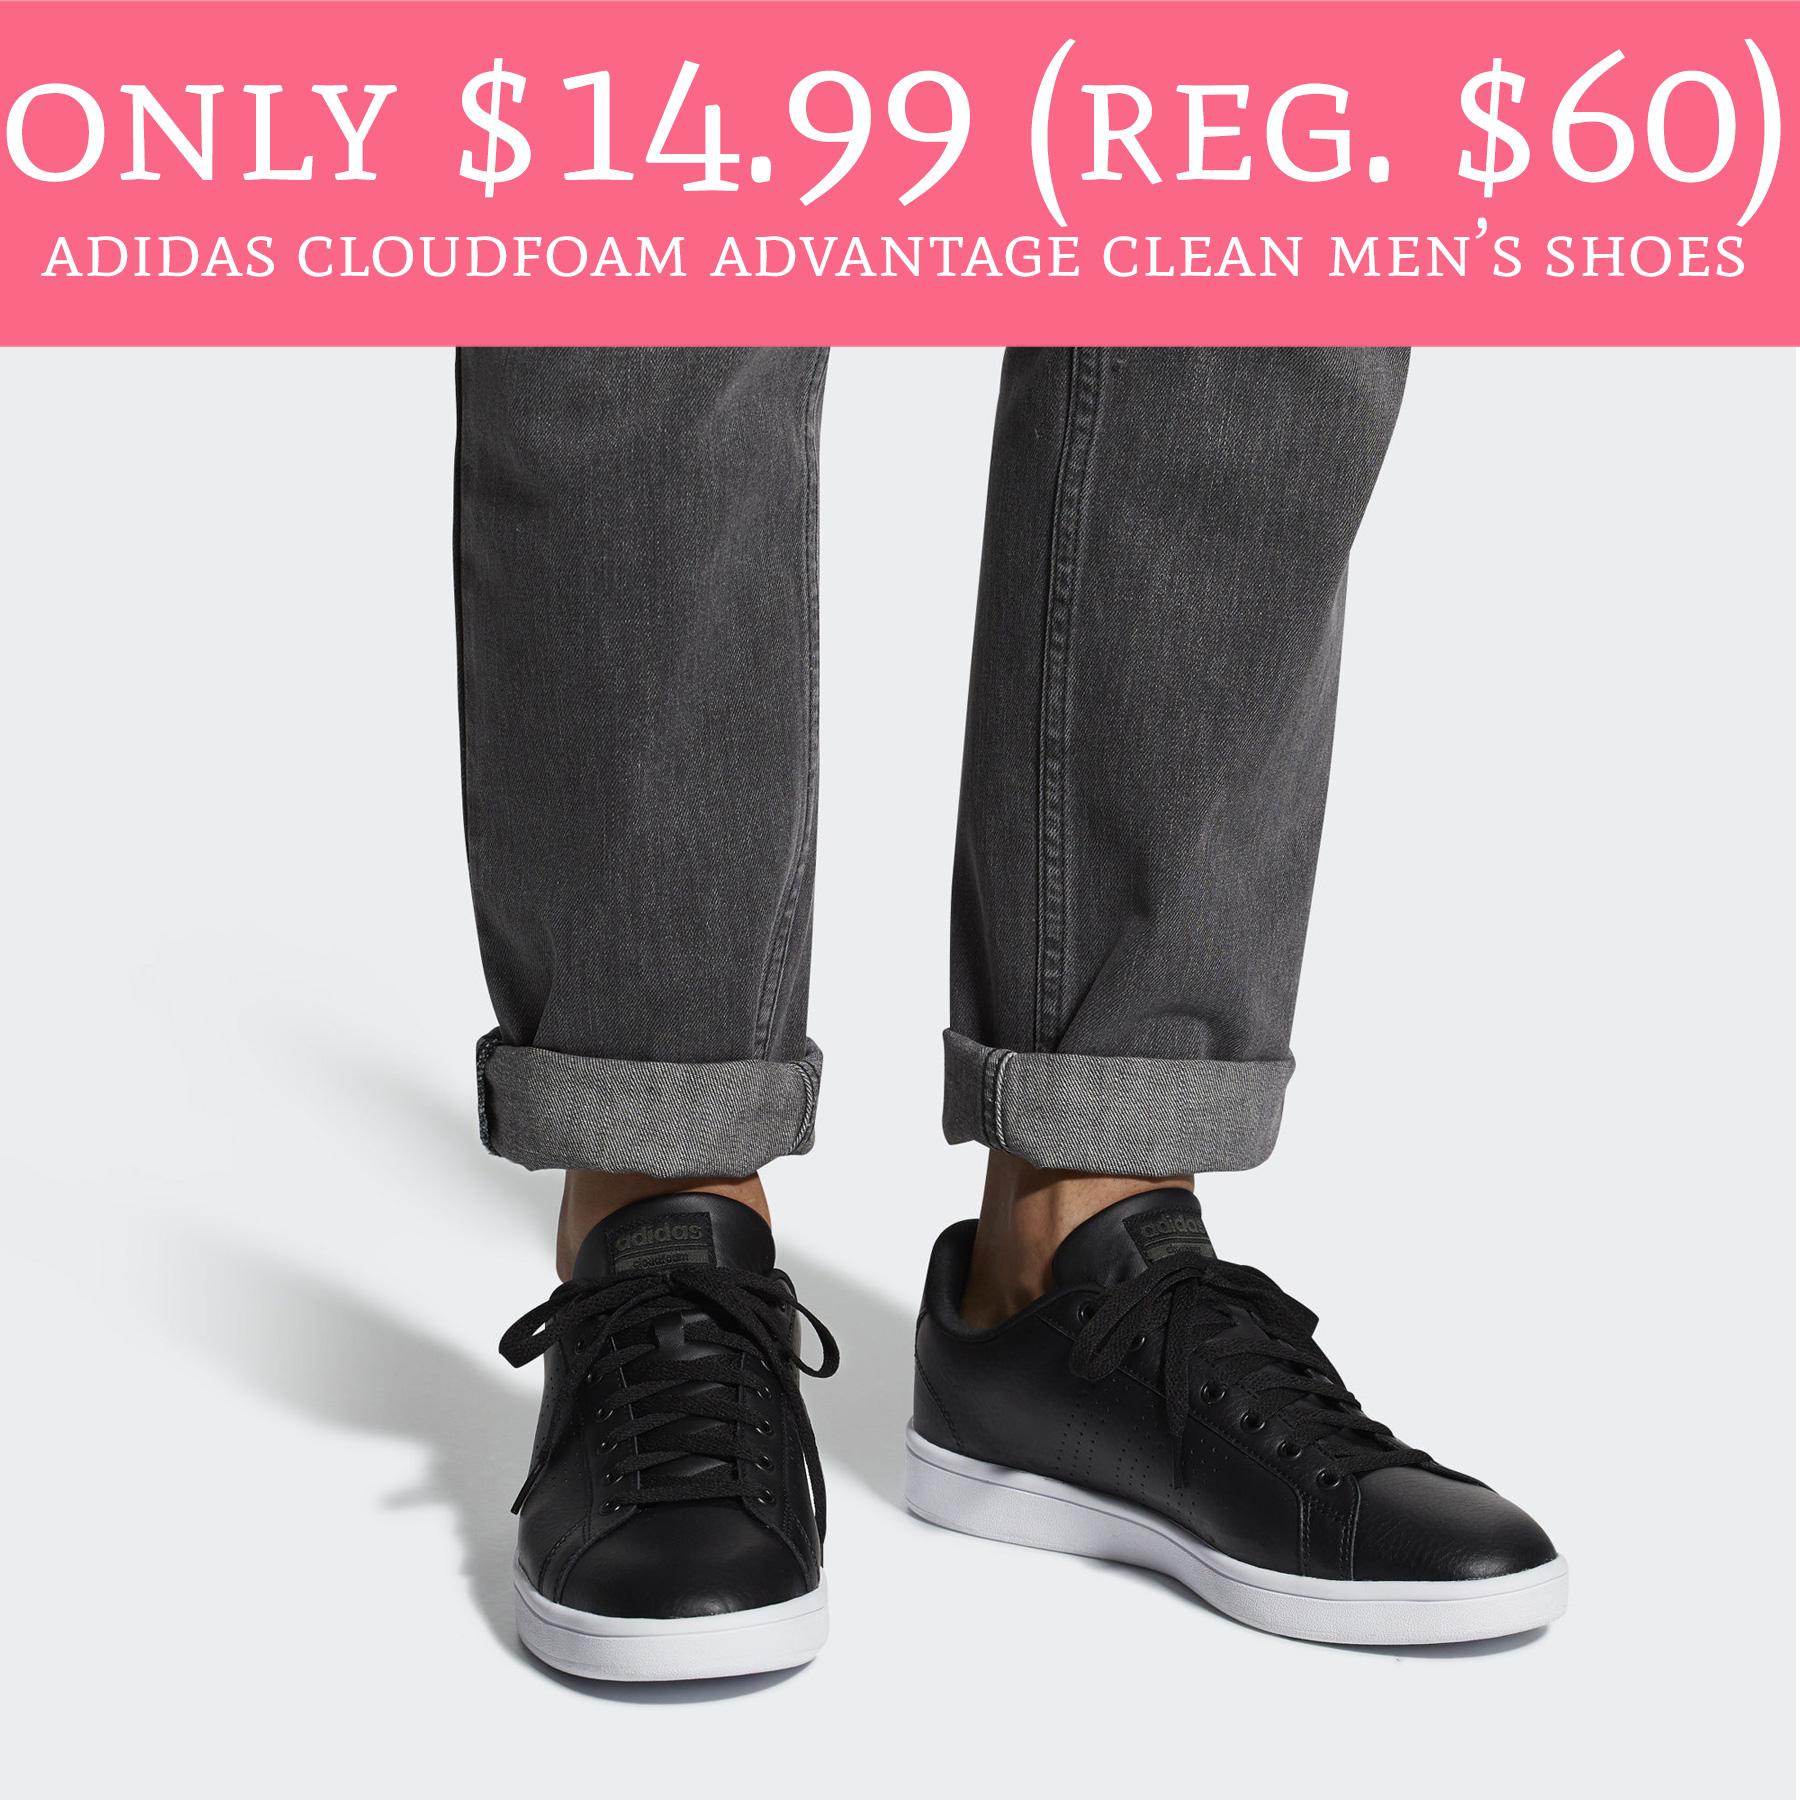 HOT! Only $14.99 (Regular $60) Adidas Cloudfoam Advantage Clean ...